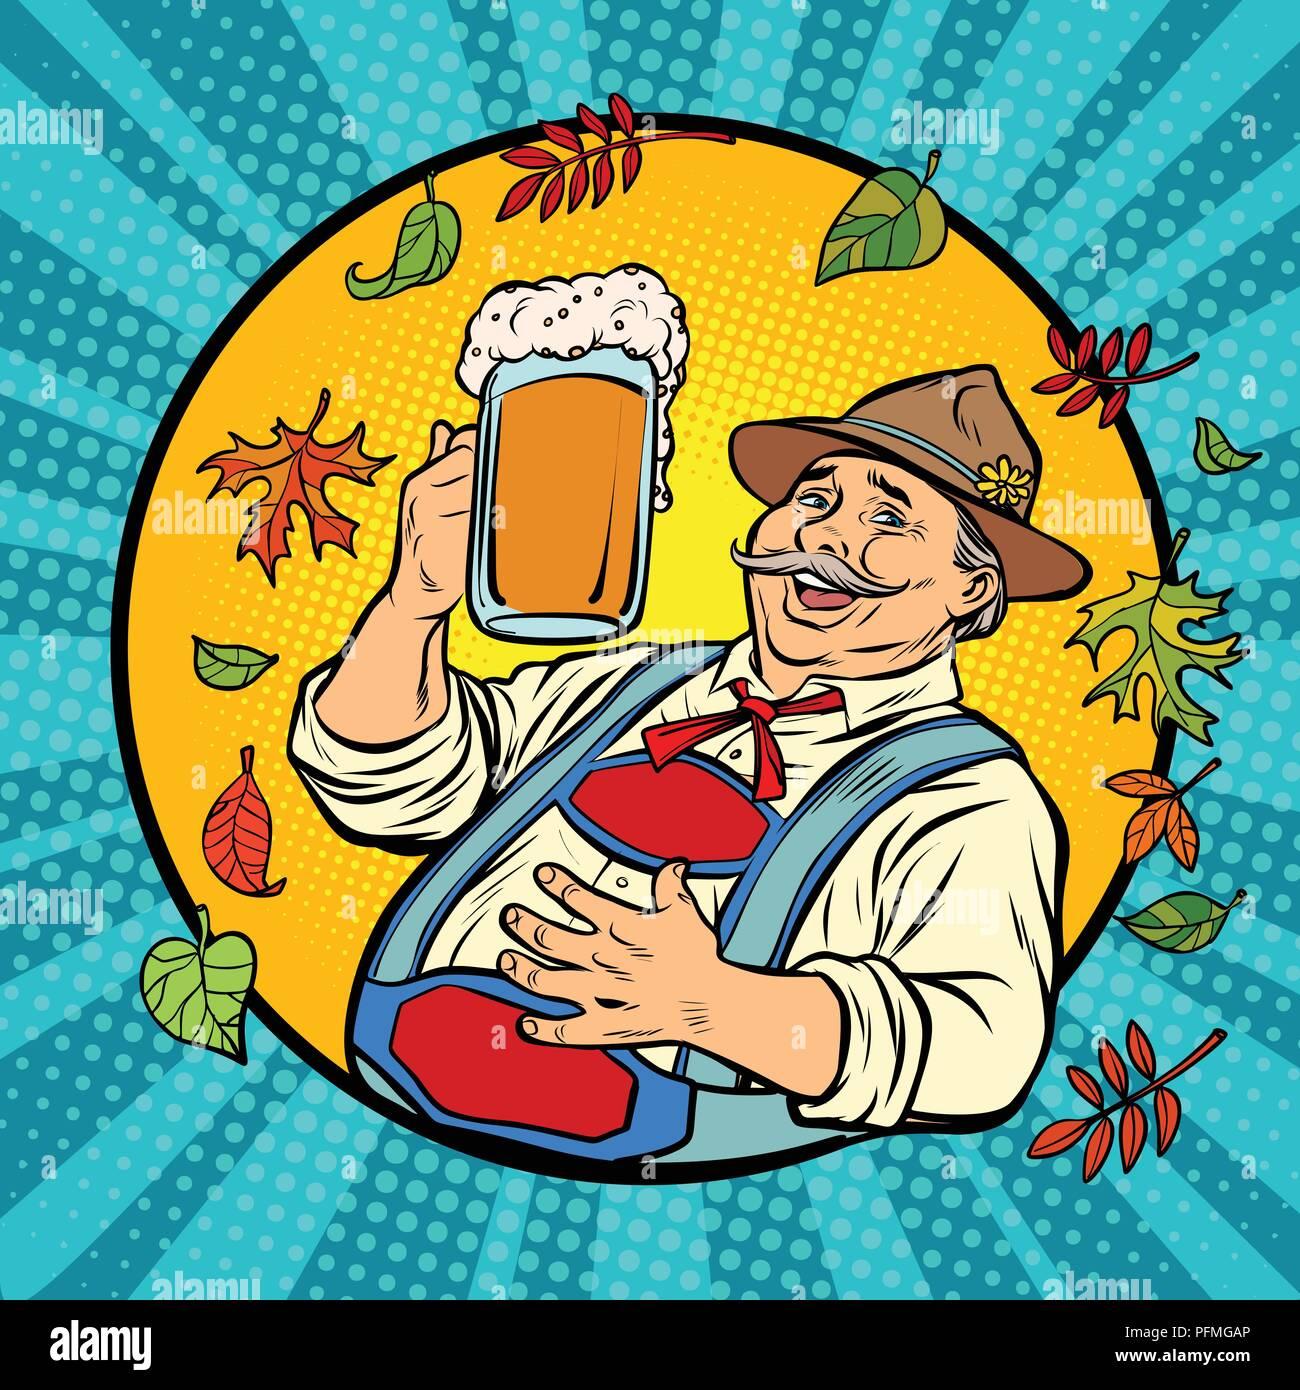 Oktoberfest German Old Man With Beer Comic Cartoon Pop Art Retro Vector Illustration Drawing Stock Vector Image Art Alamy